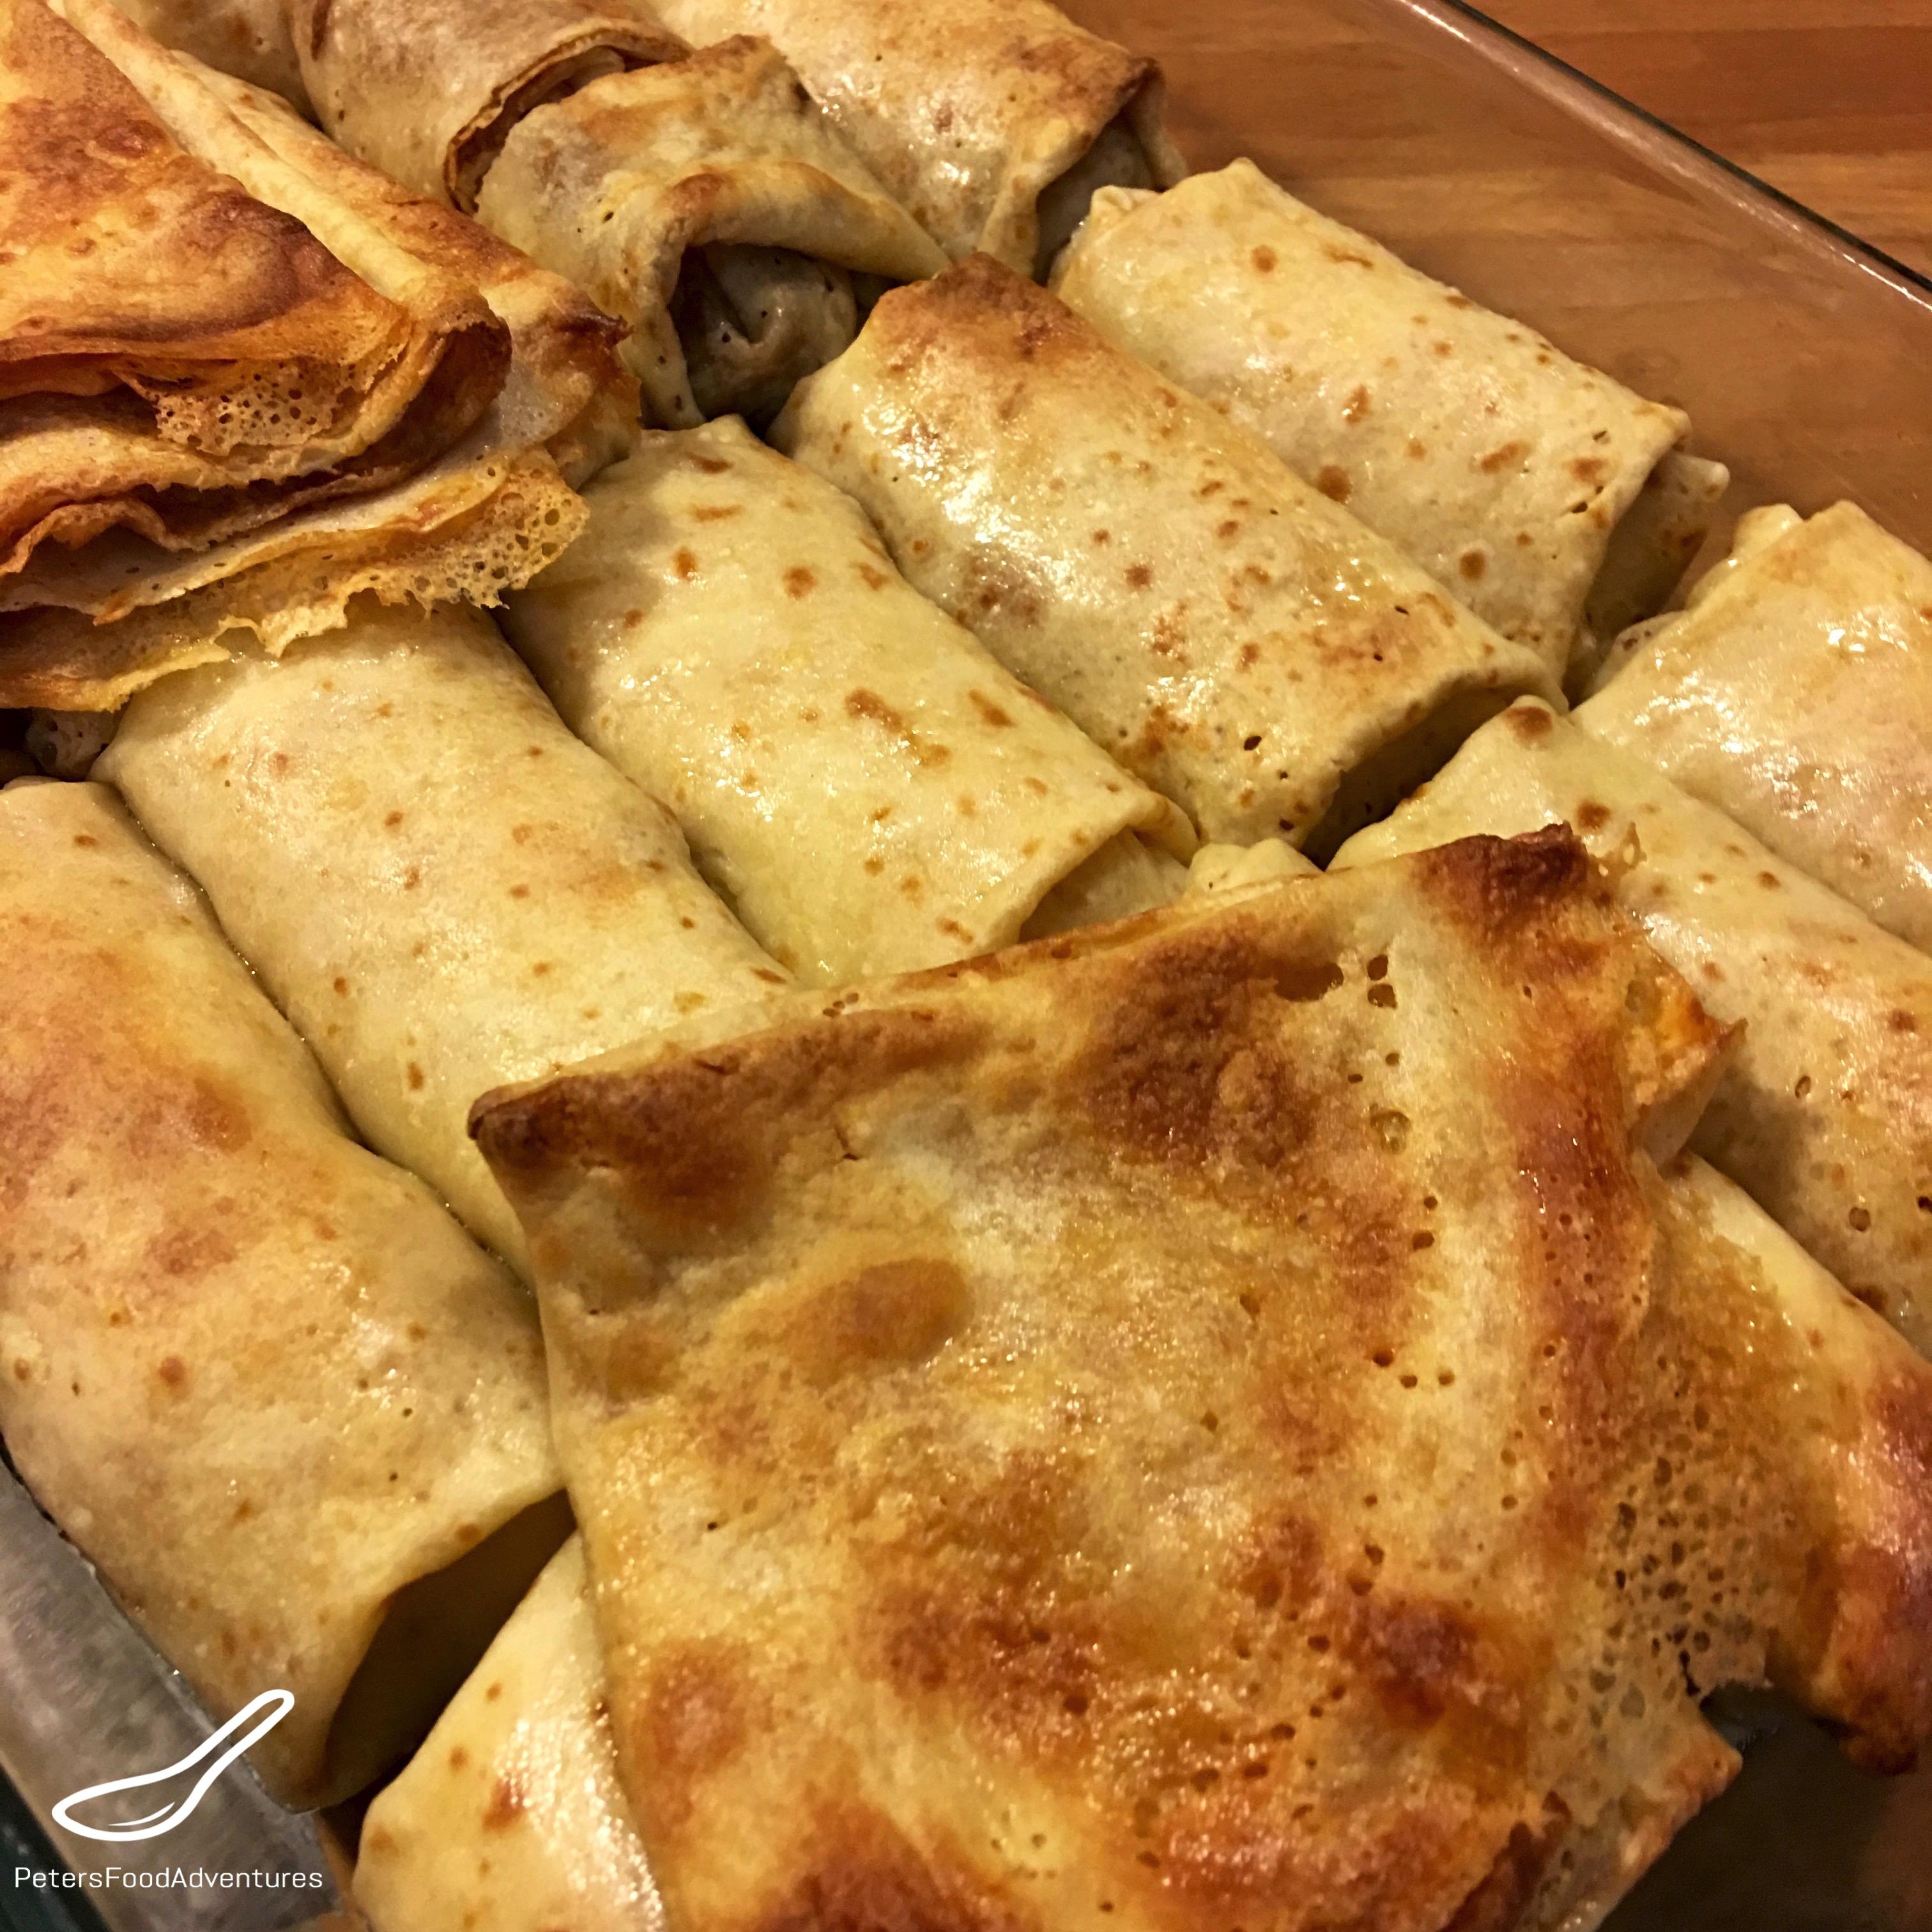 Blini Blintzes Stuffed with Meat (Блинчики с мясом)